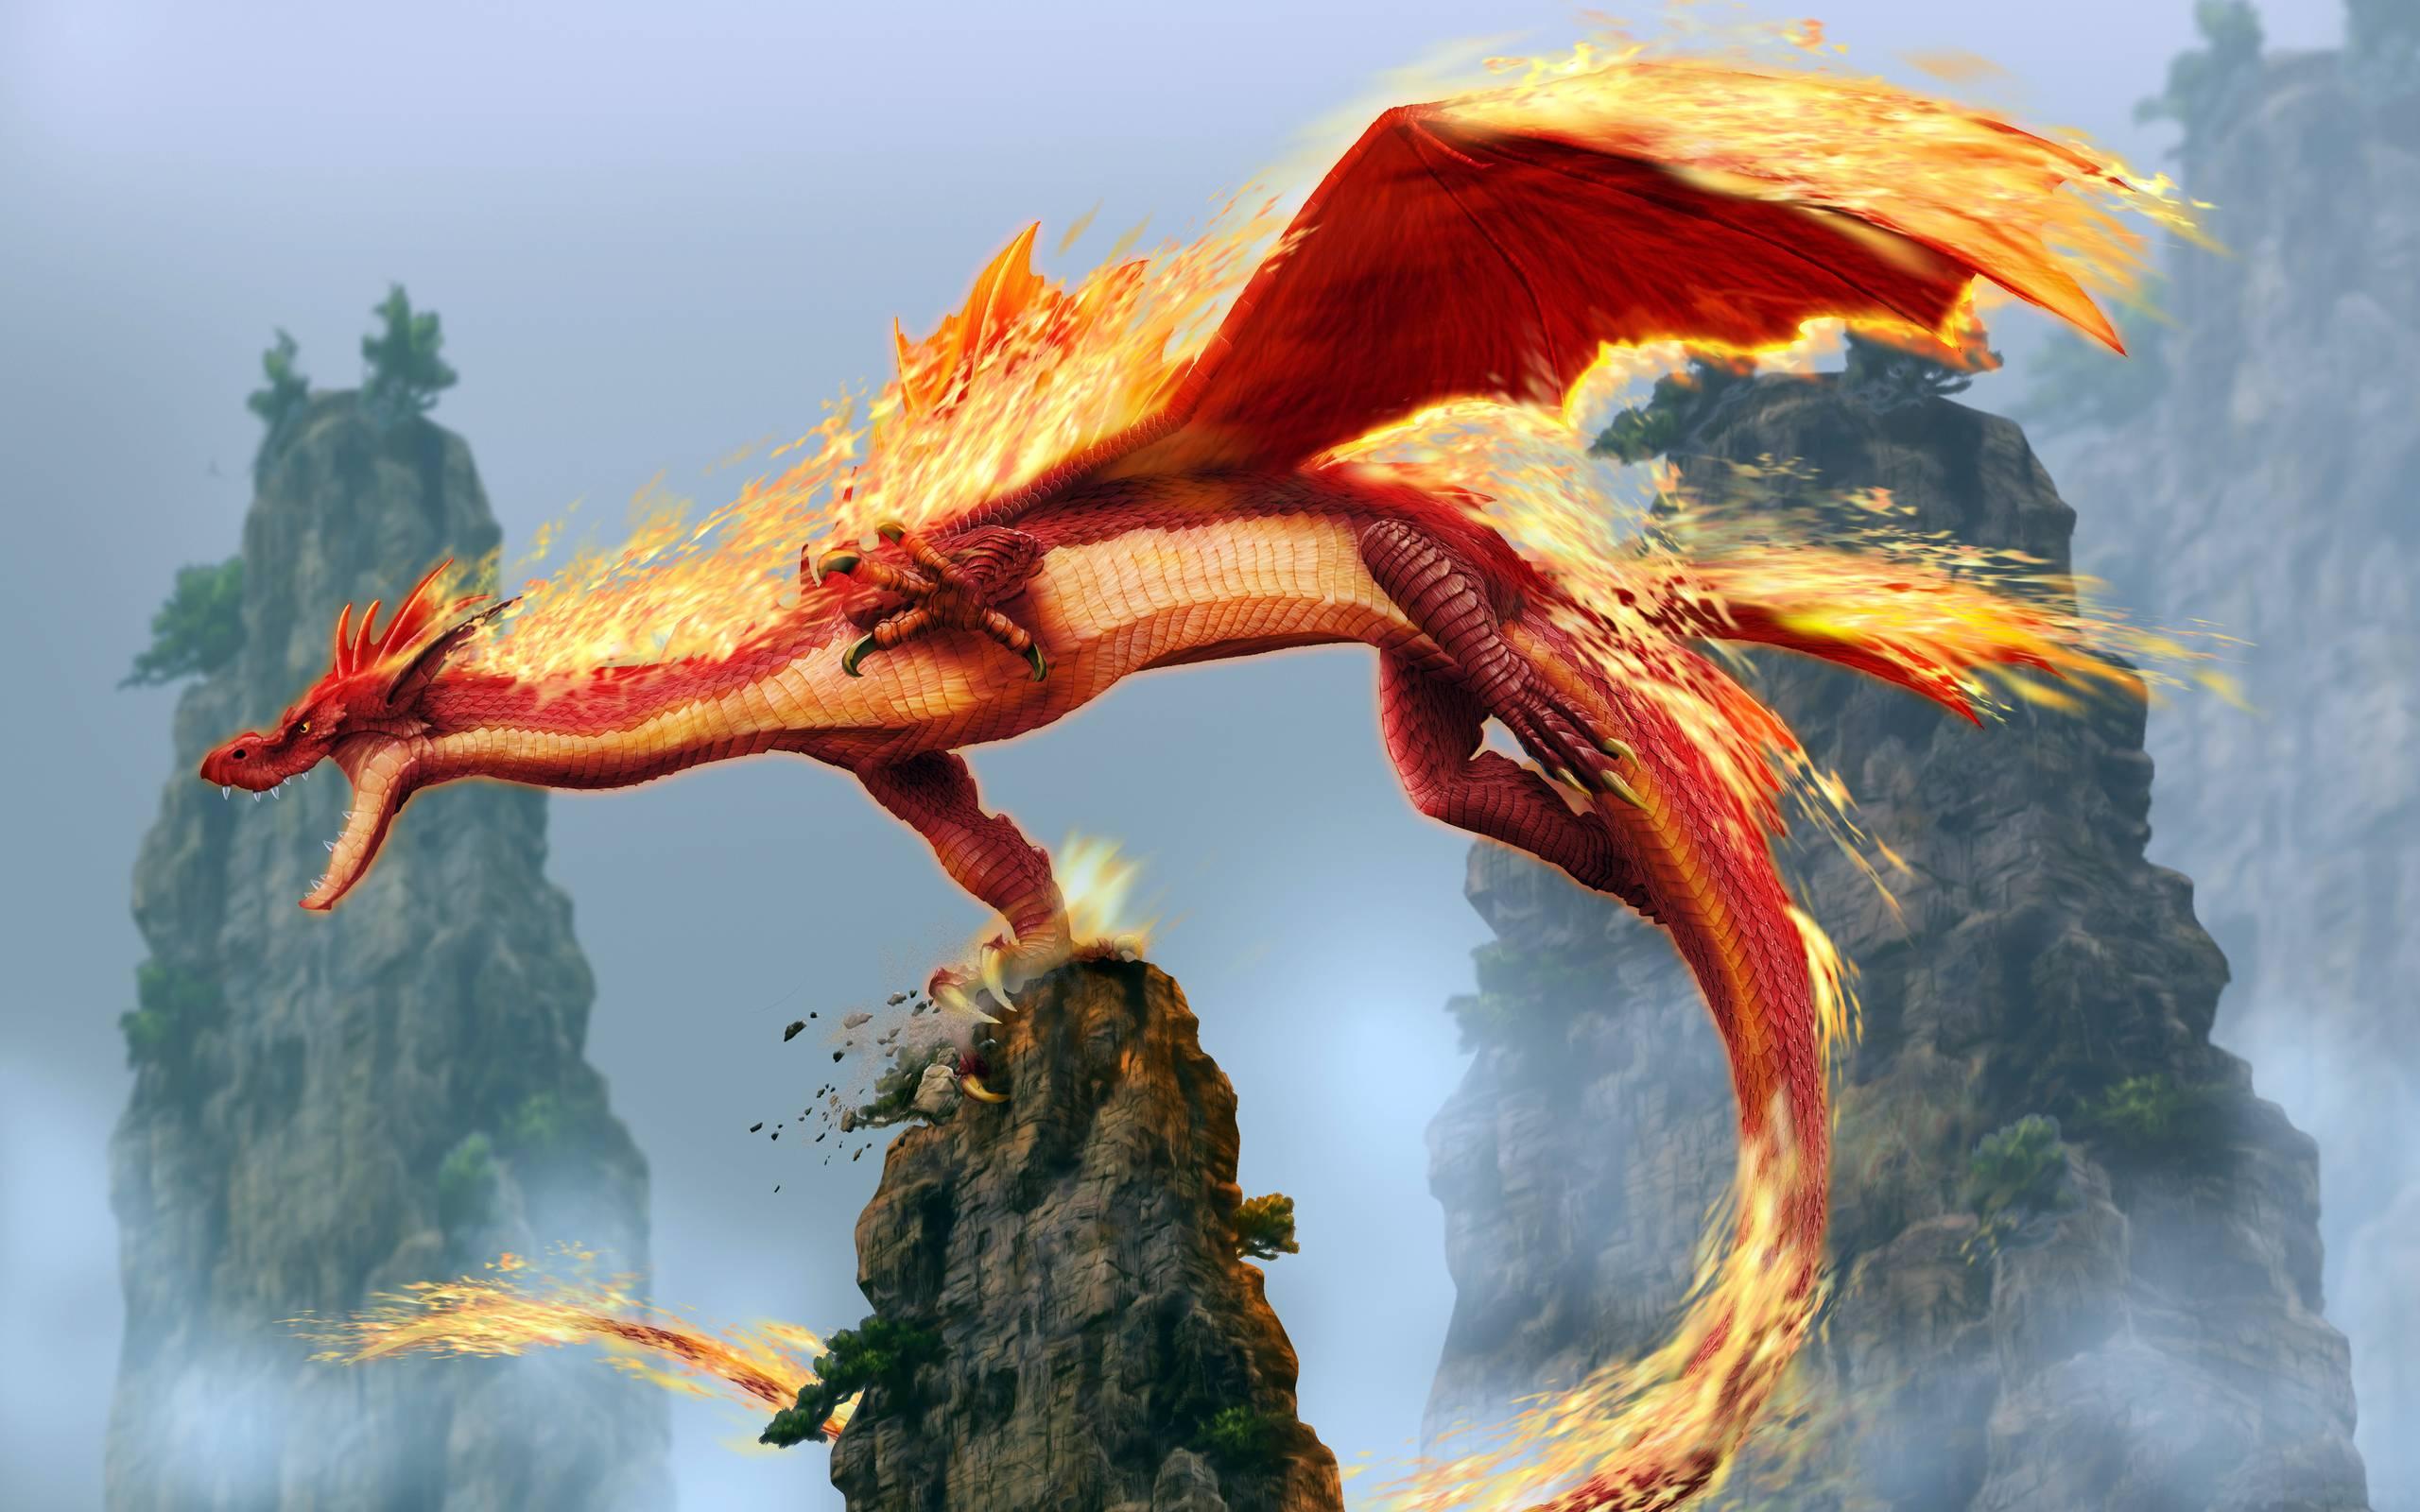 HD Dragon Wallpapers - Wallpaper Cave